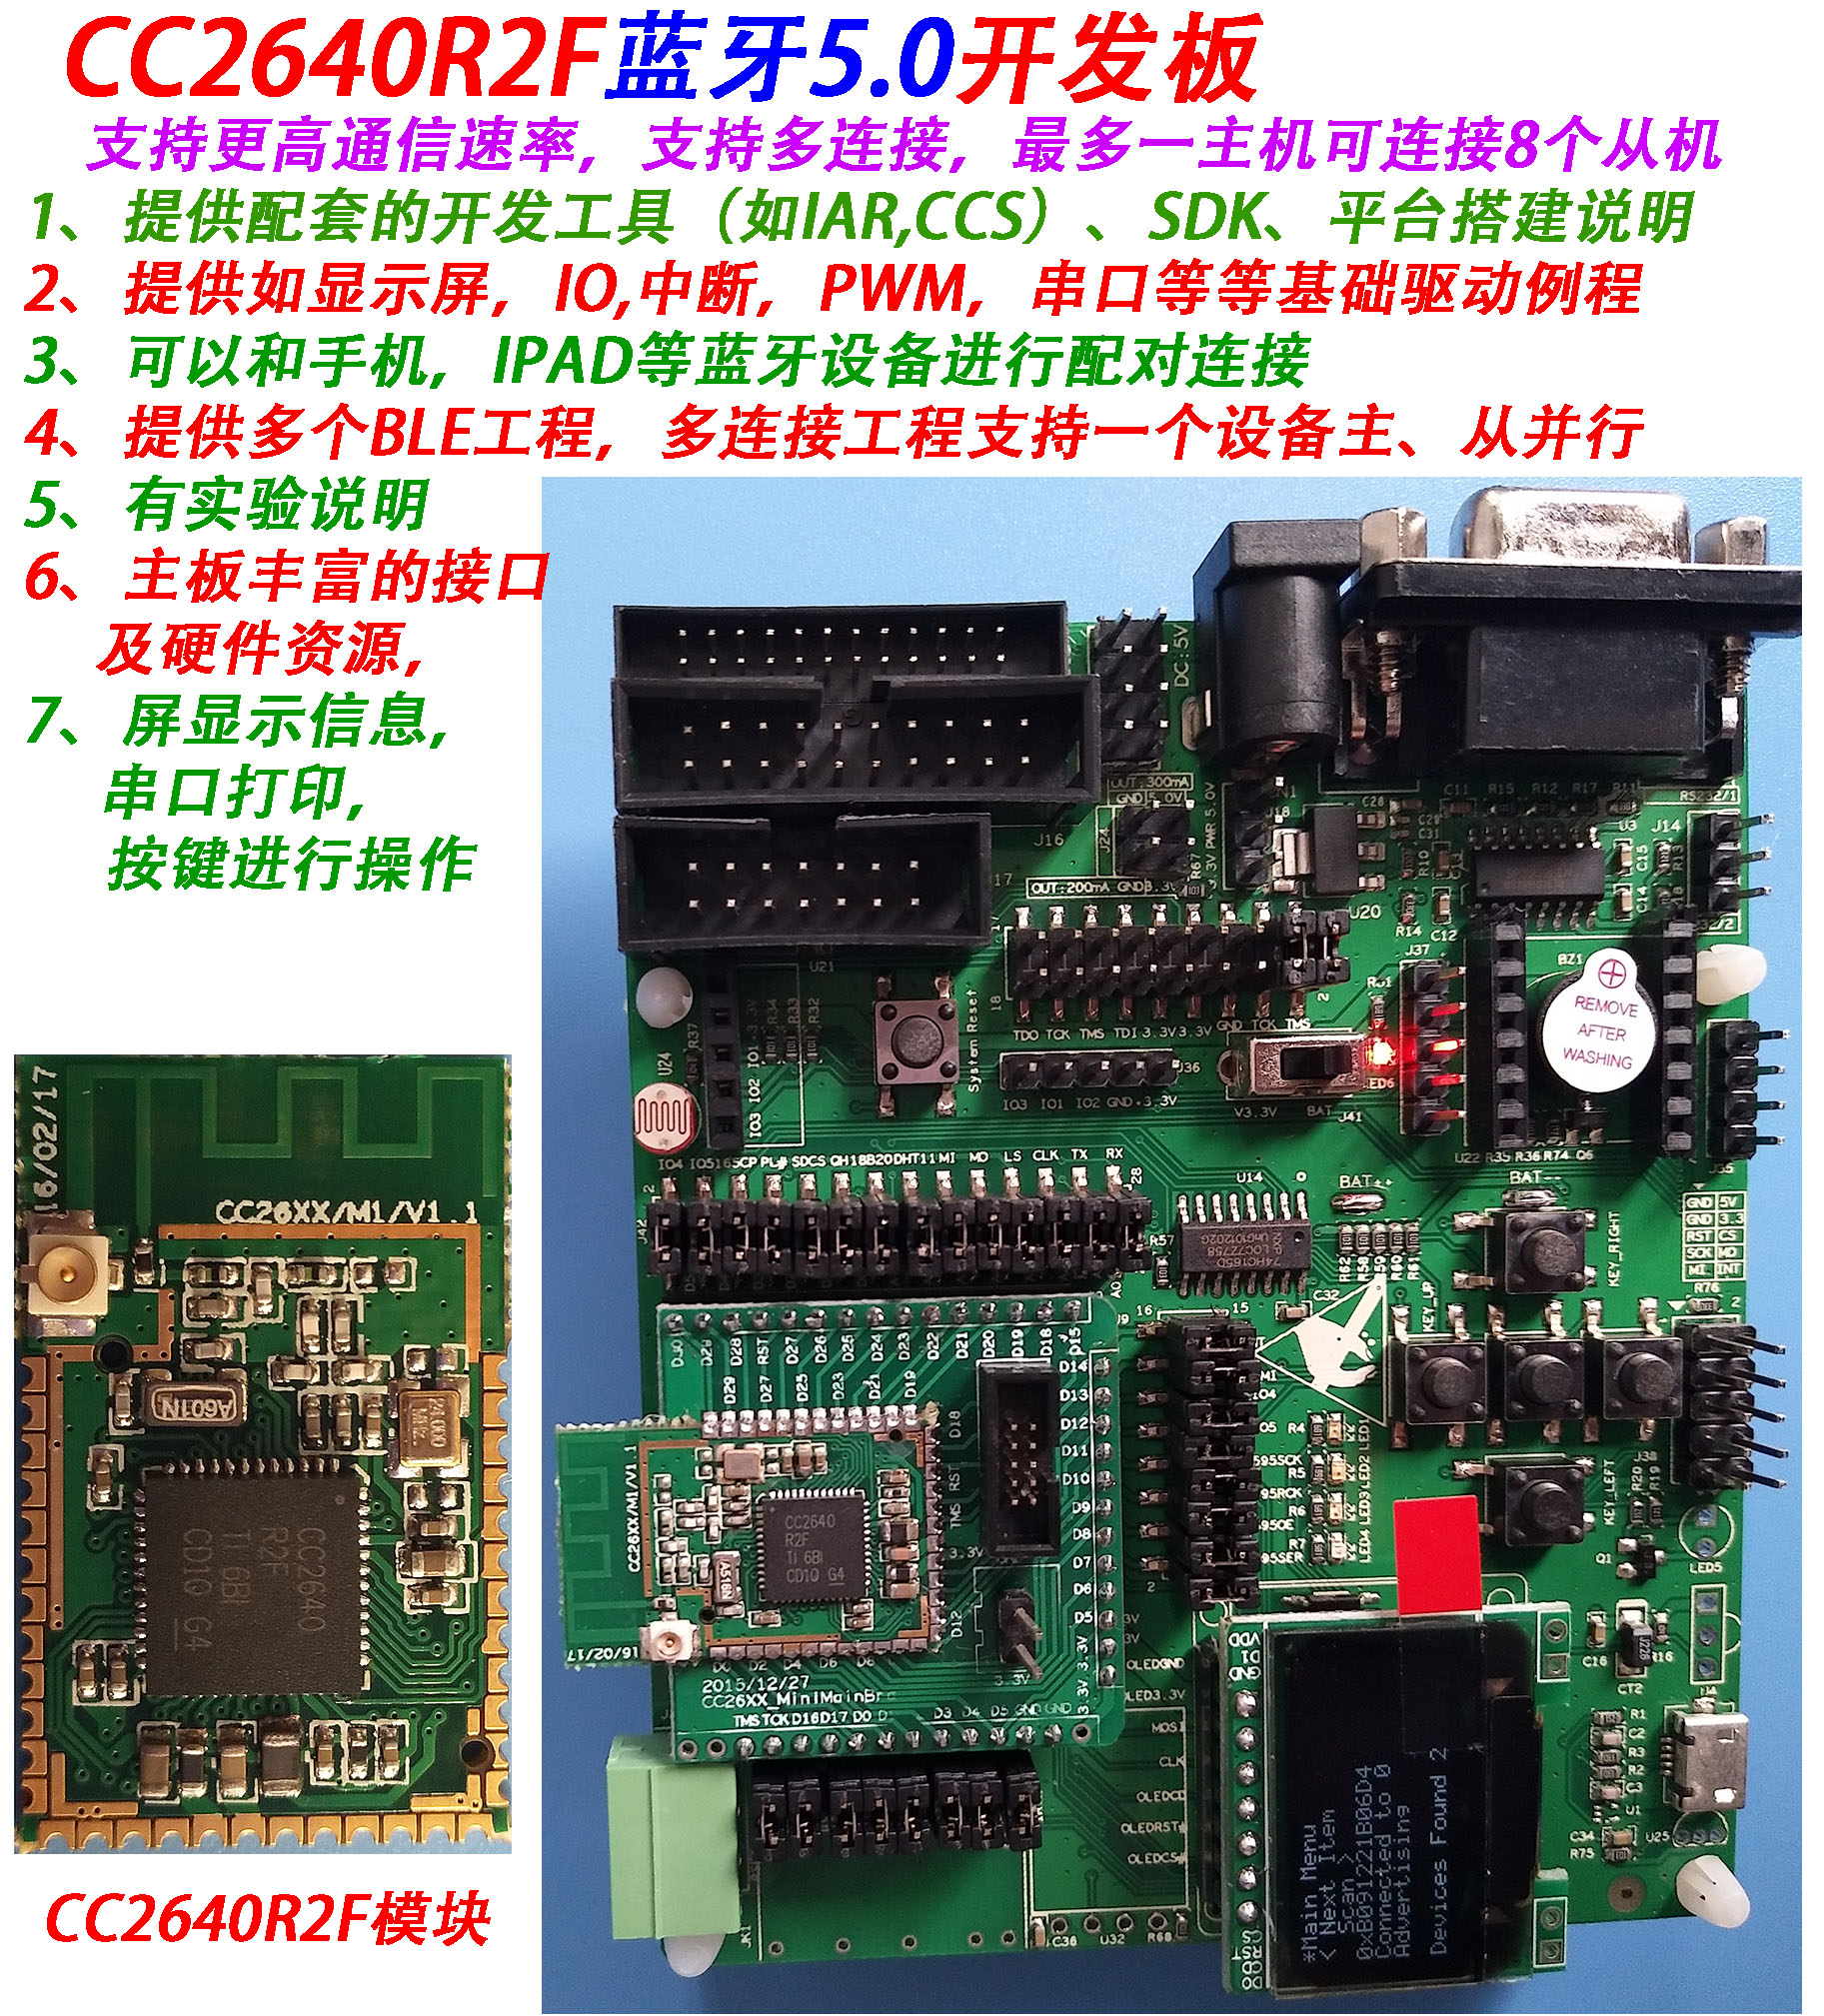 CC2640R2F module, CC2640R2 development board, support Bluetooth 5, Bluetooth 4.2 cc2640r2f coreboard wireless bluetooth 5 0 module development board wireless board